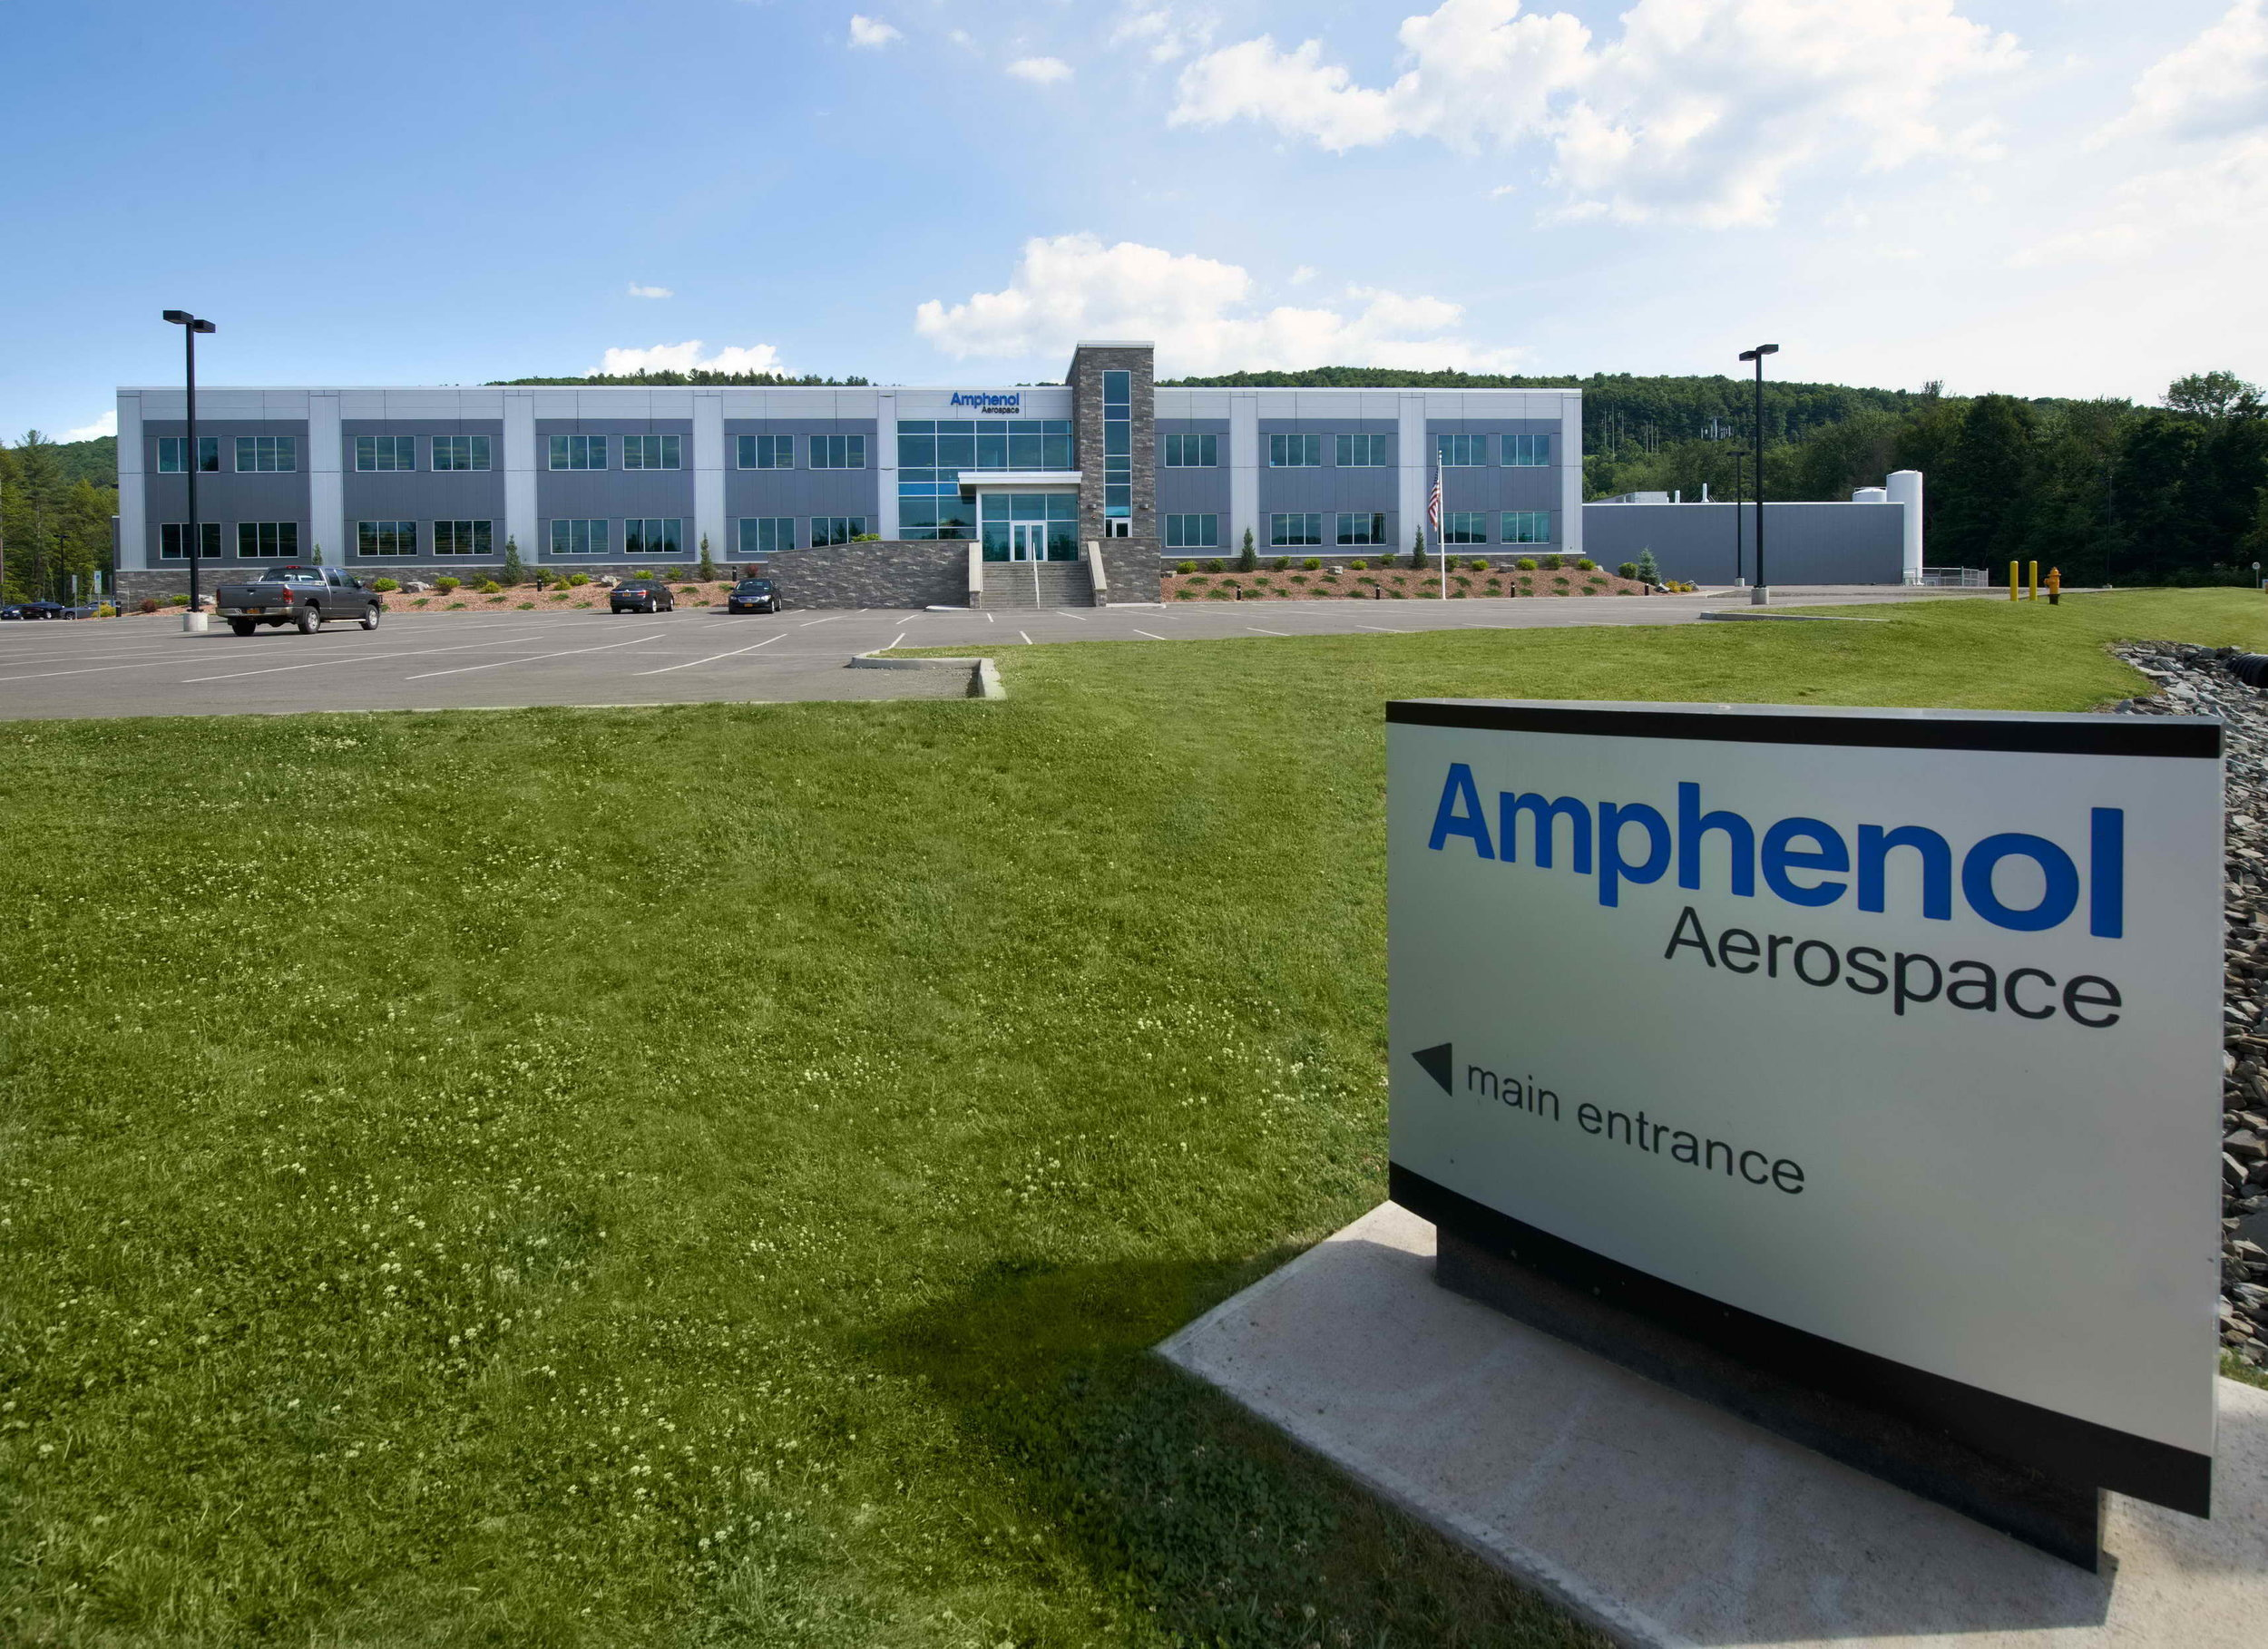 AmphenolAerospace-Exterior-003.jpg